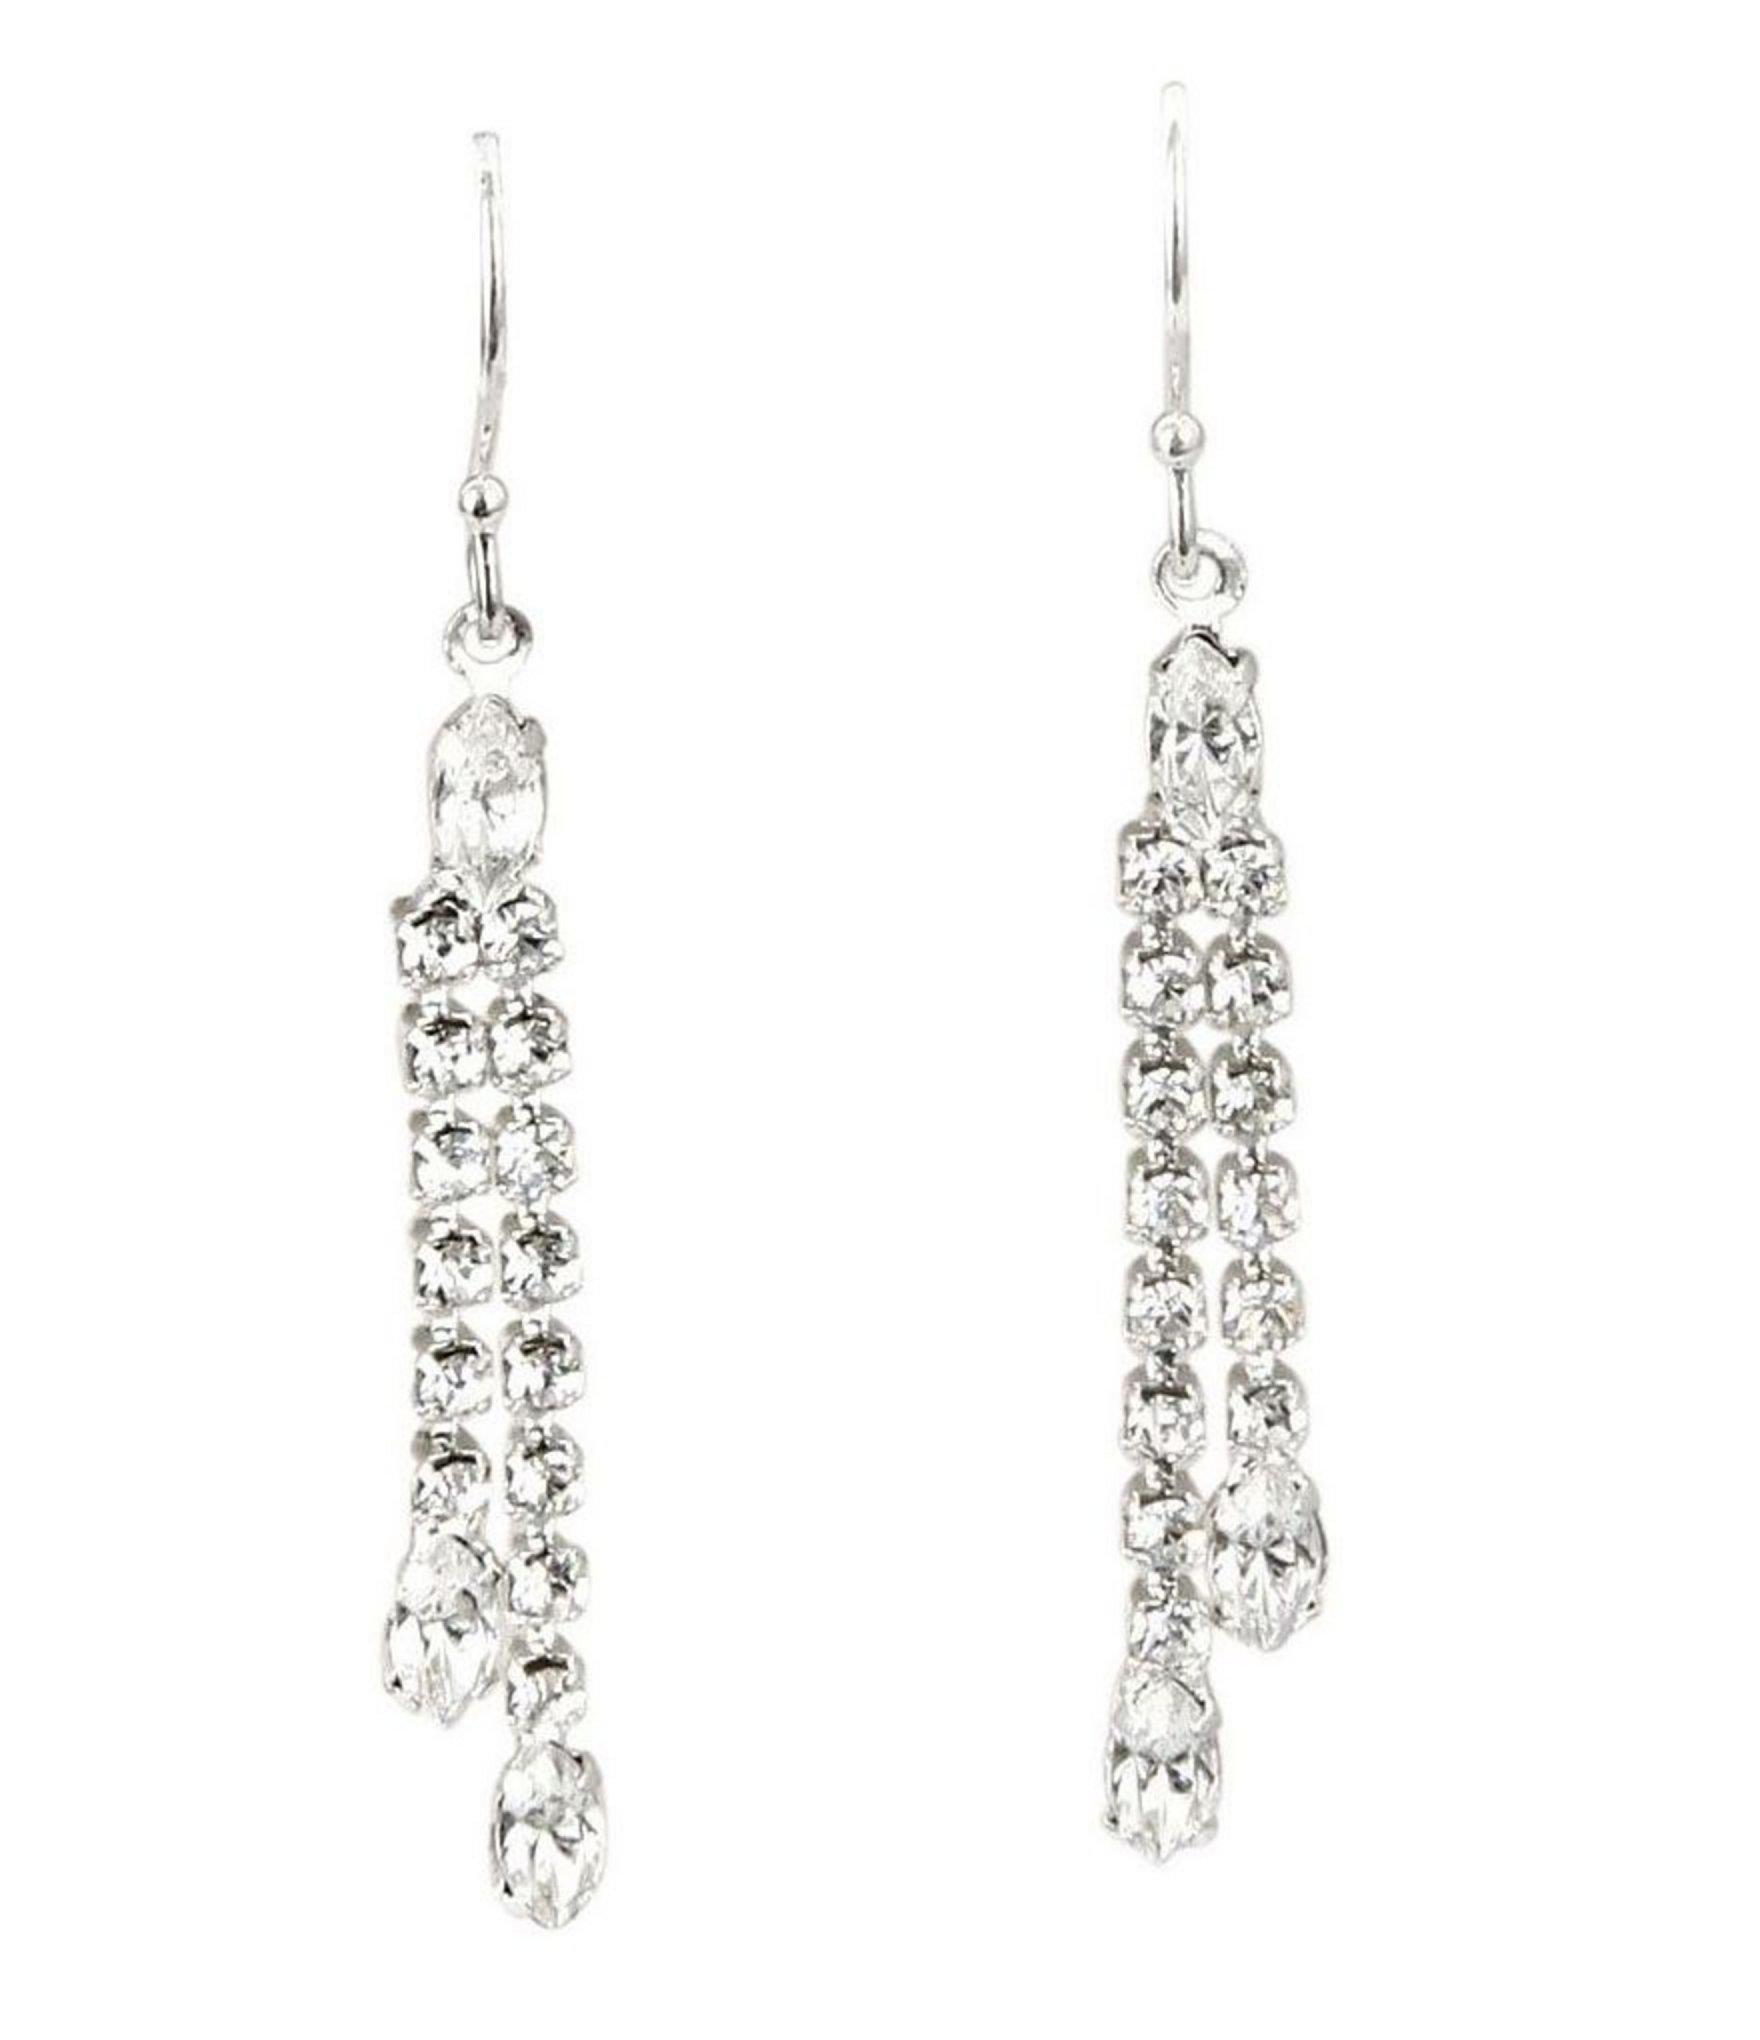 df7fac9cf Cezanne - Metallic Crystal Drop Earrings - Lyst. View fullscreen